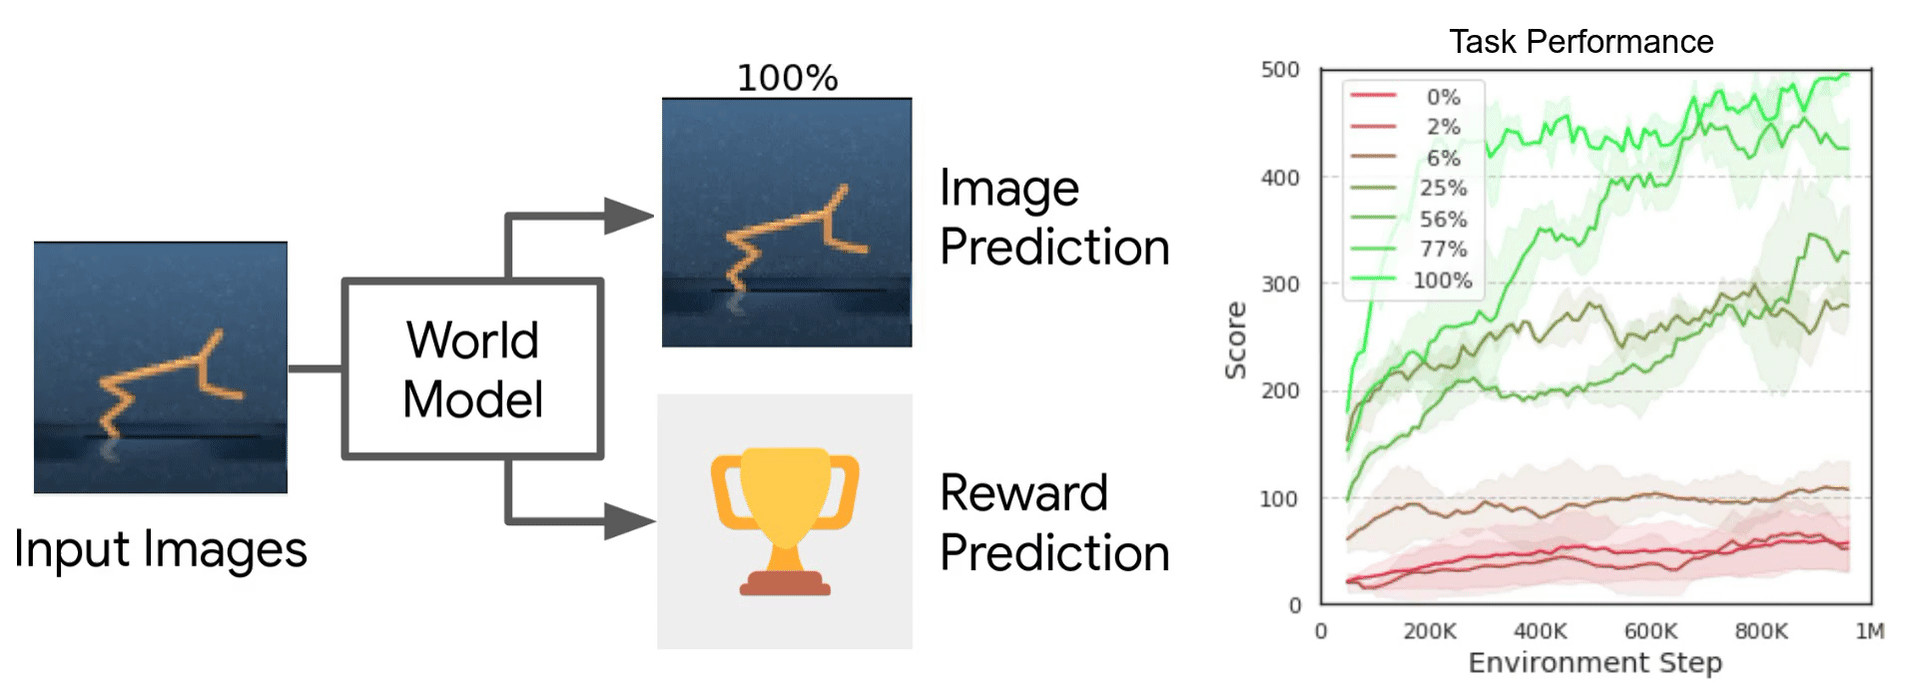 images prediction through world model